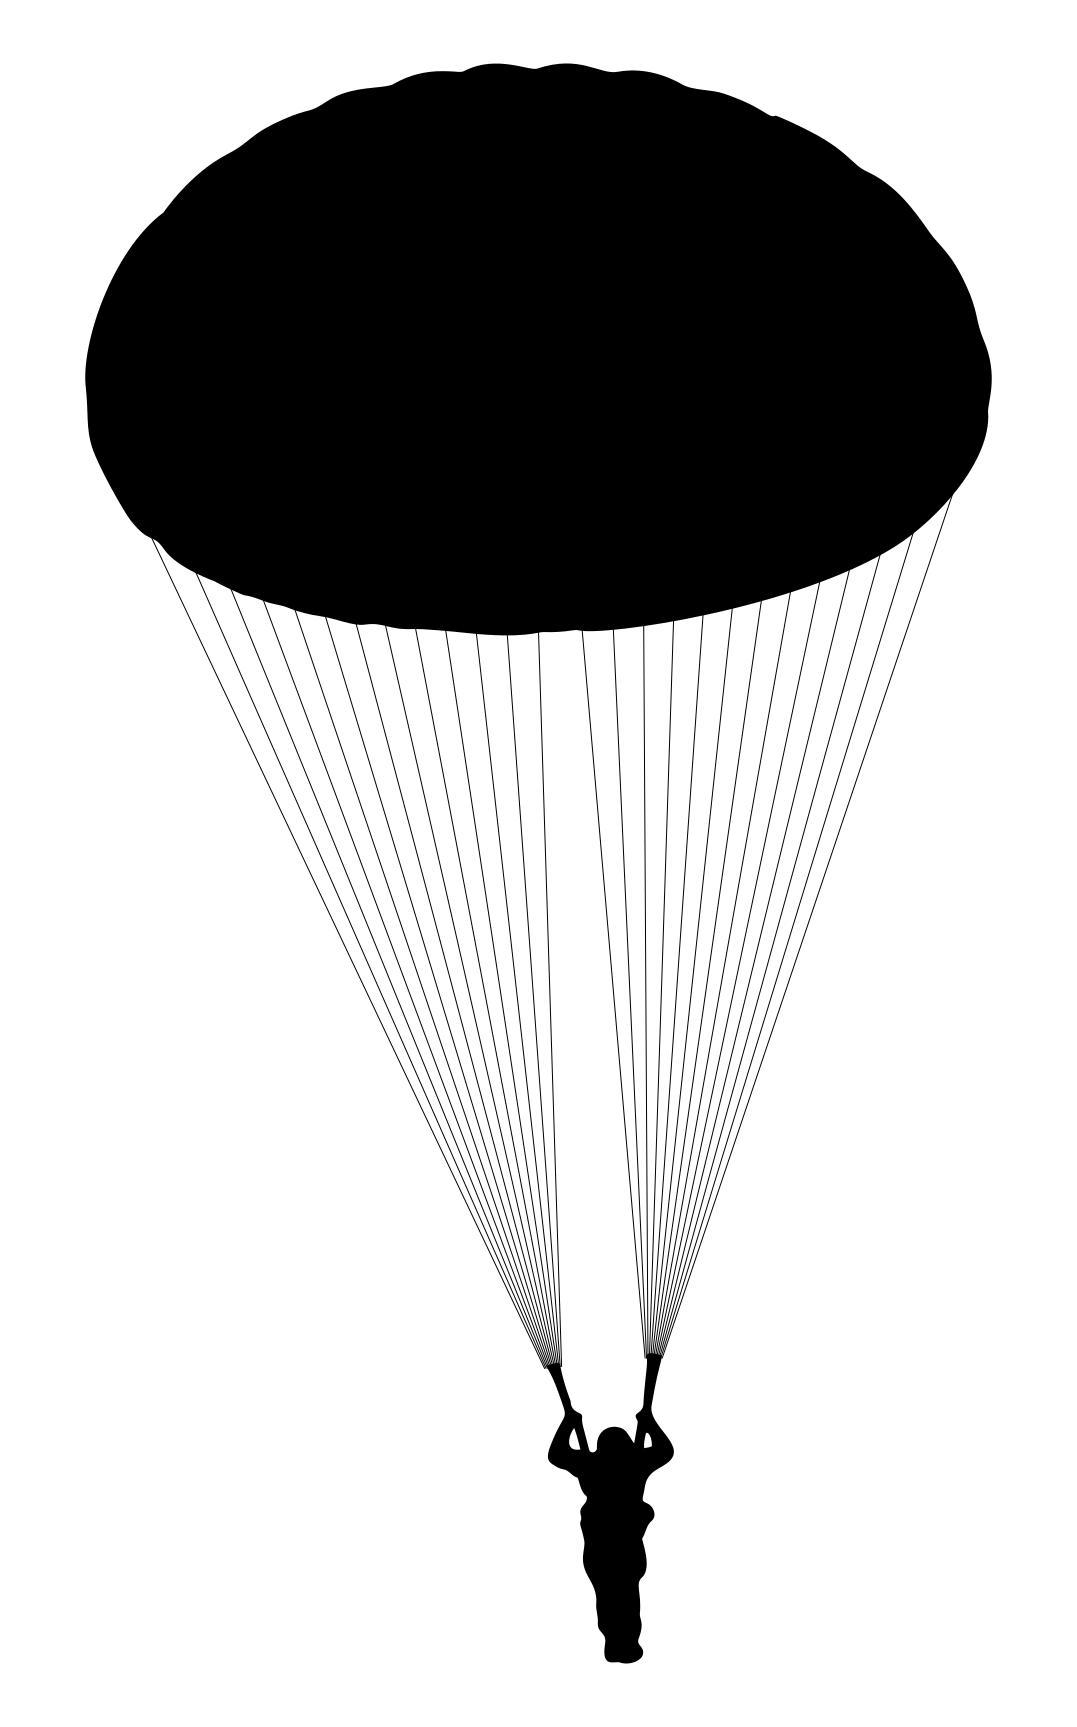 1077x1727 Parachute Silhouette 2 Clipart